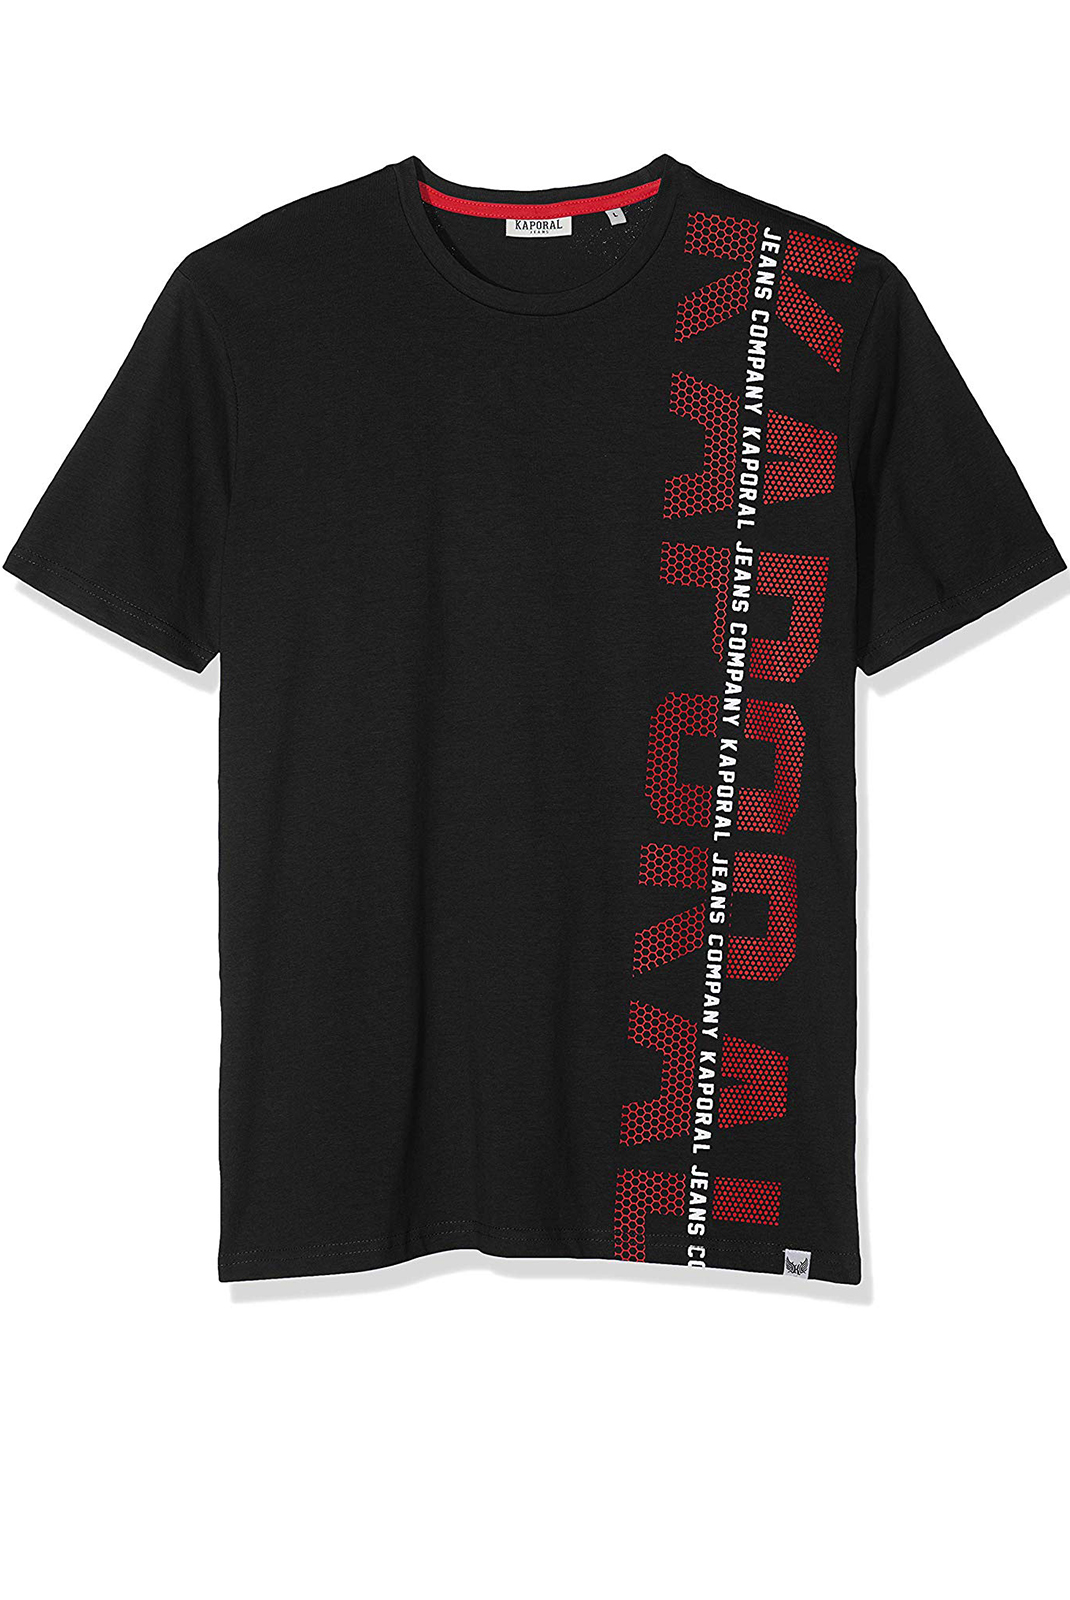 Tee-shirts  Kaporal OLARK BLACK